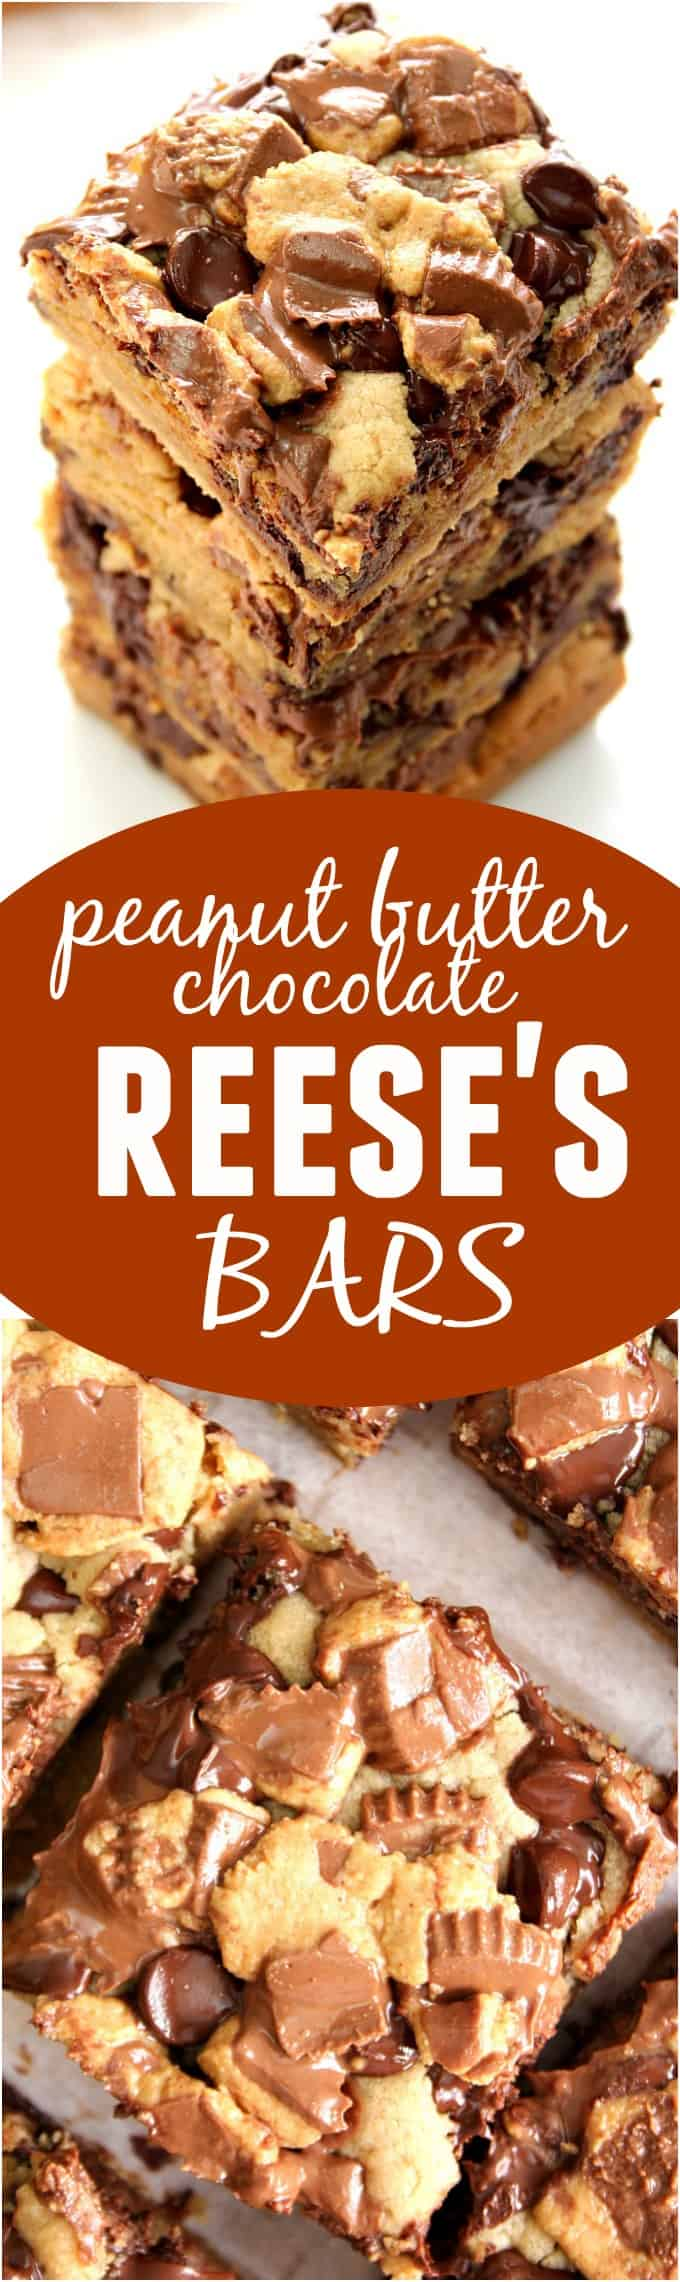 reeses bars long Peanut Butter Chocolate Reeses Bars Recipe